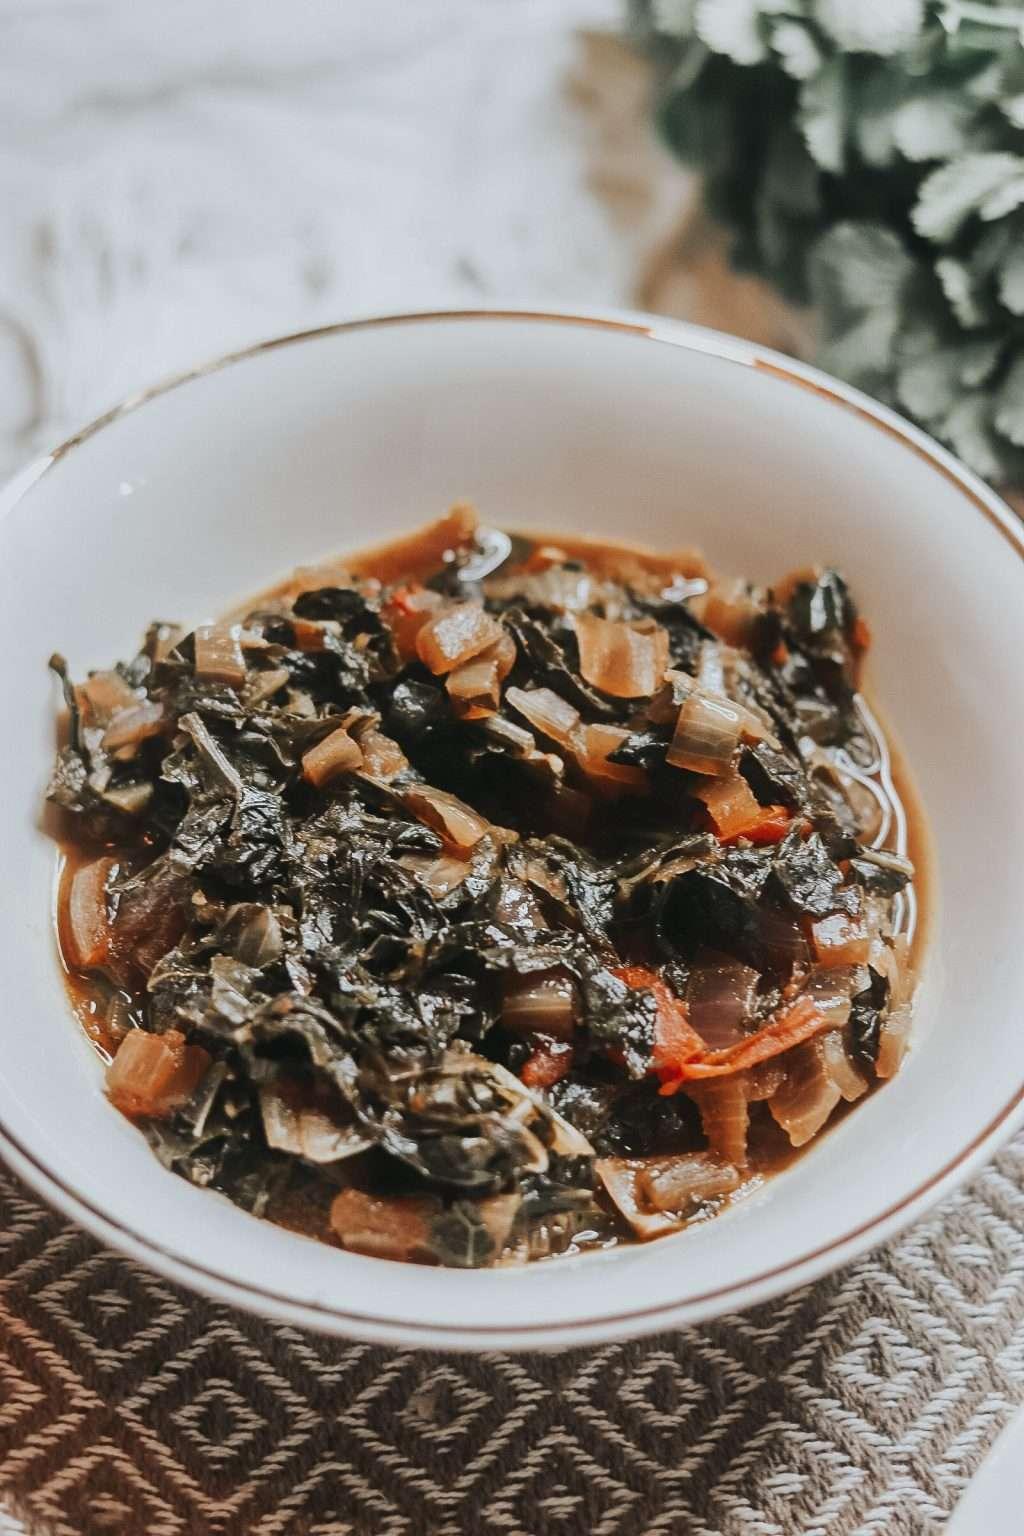 Vegan collard greens recipe 2940 1024x1536 - Vegan Collard Greens Recipe + Why I'm Going Vegan